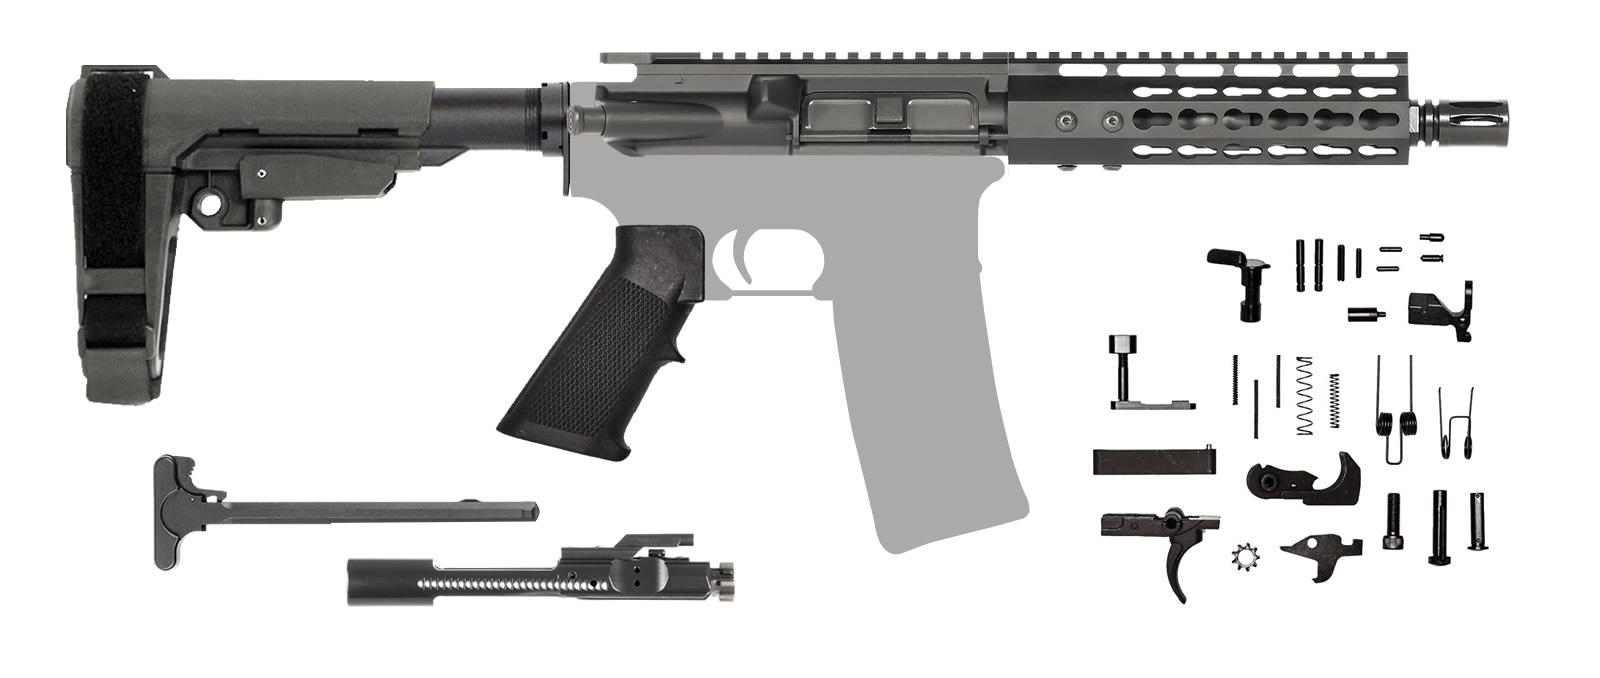 AR-15 AR Pistol Kit – 7.5 Inch / .223 NATO / Keymod / SBA3